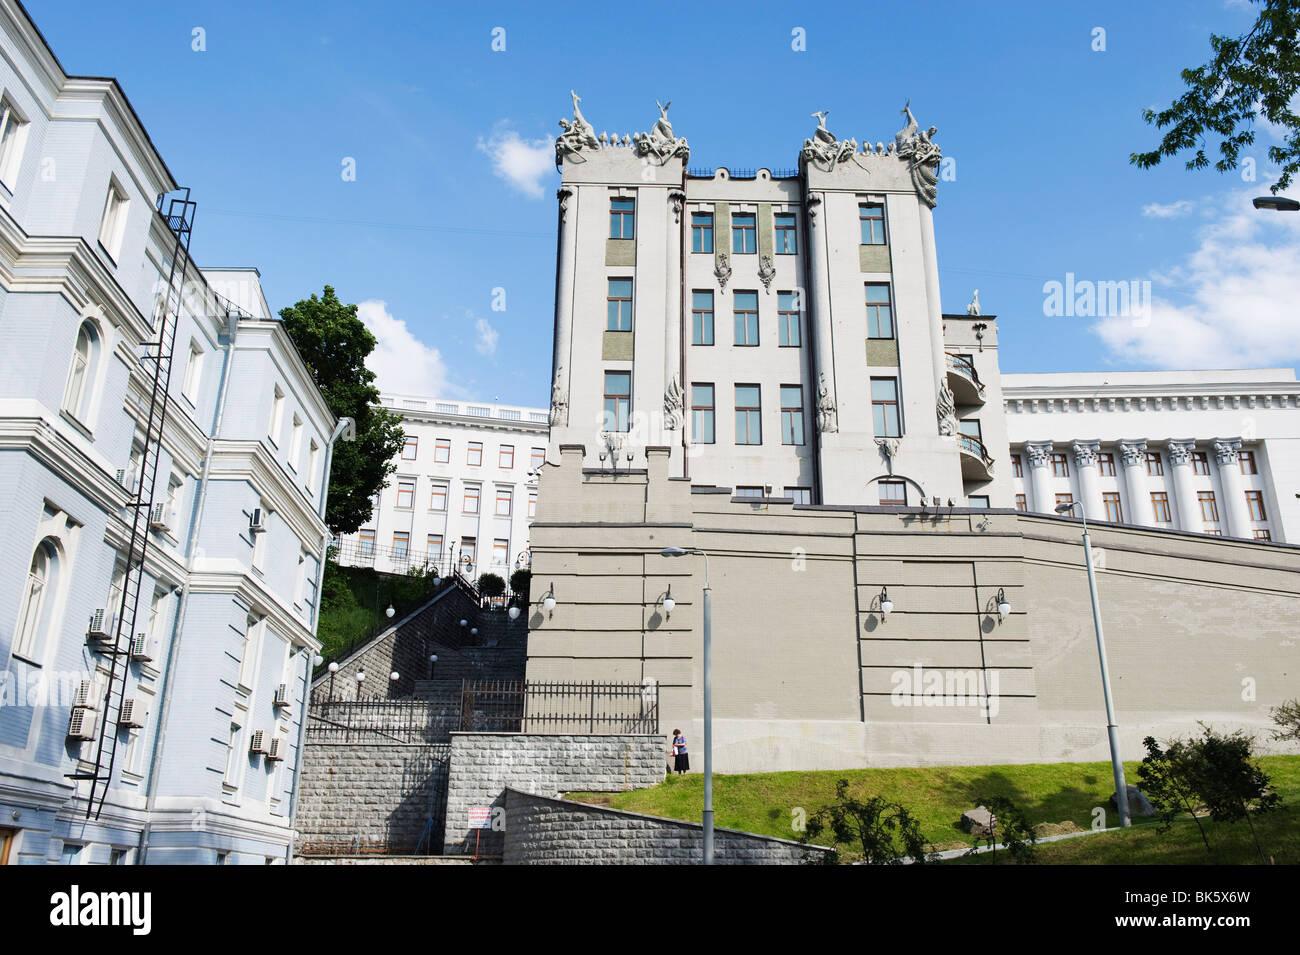 Casa de quimeras, la arquitectura del siglo XX por Vladislav Horodetsky, Kiev, Ucrania, Europa Imagen De Stock